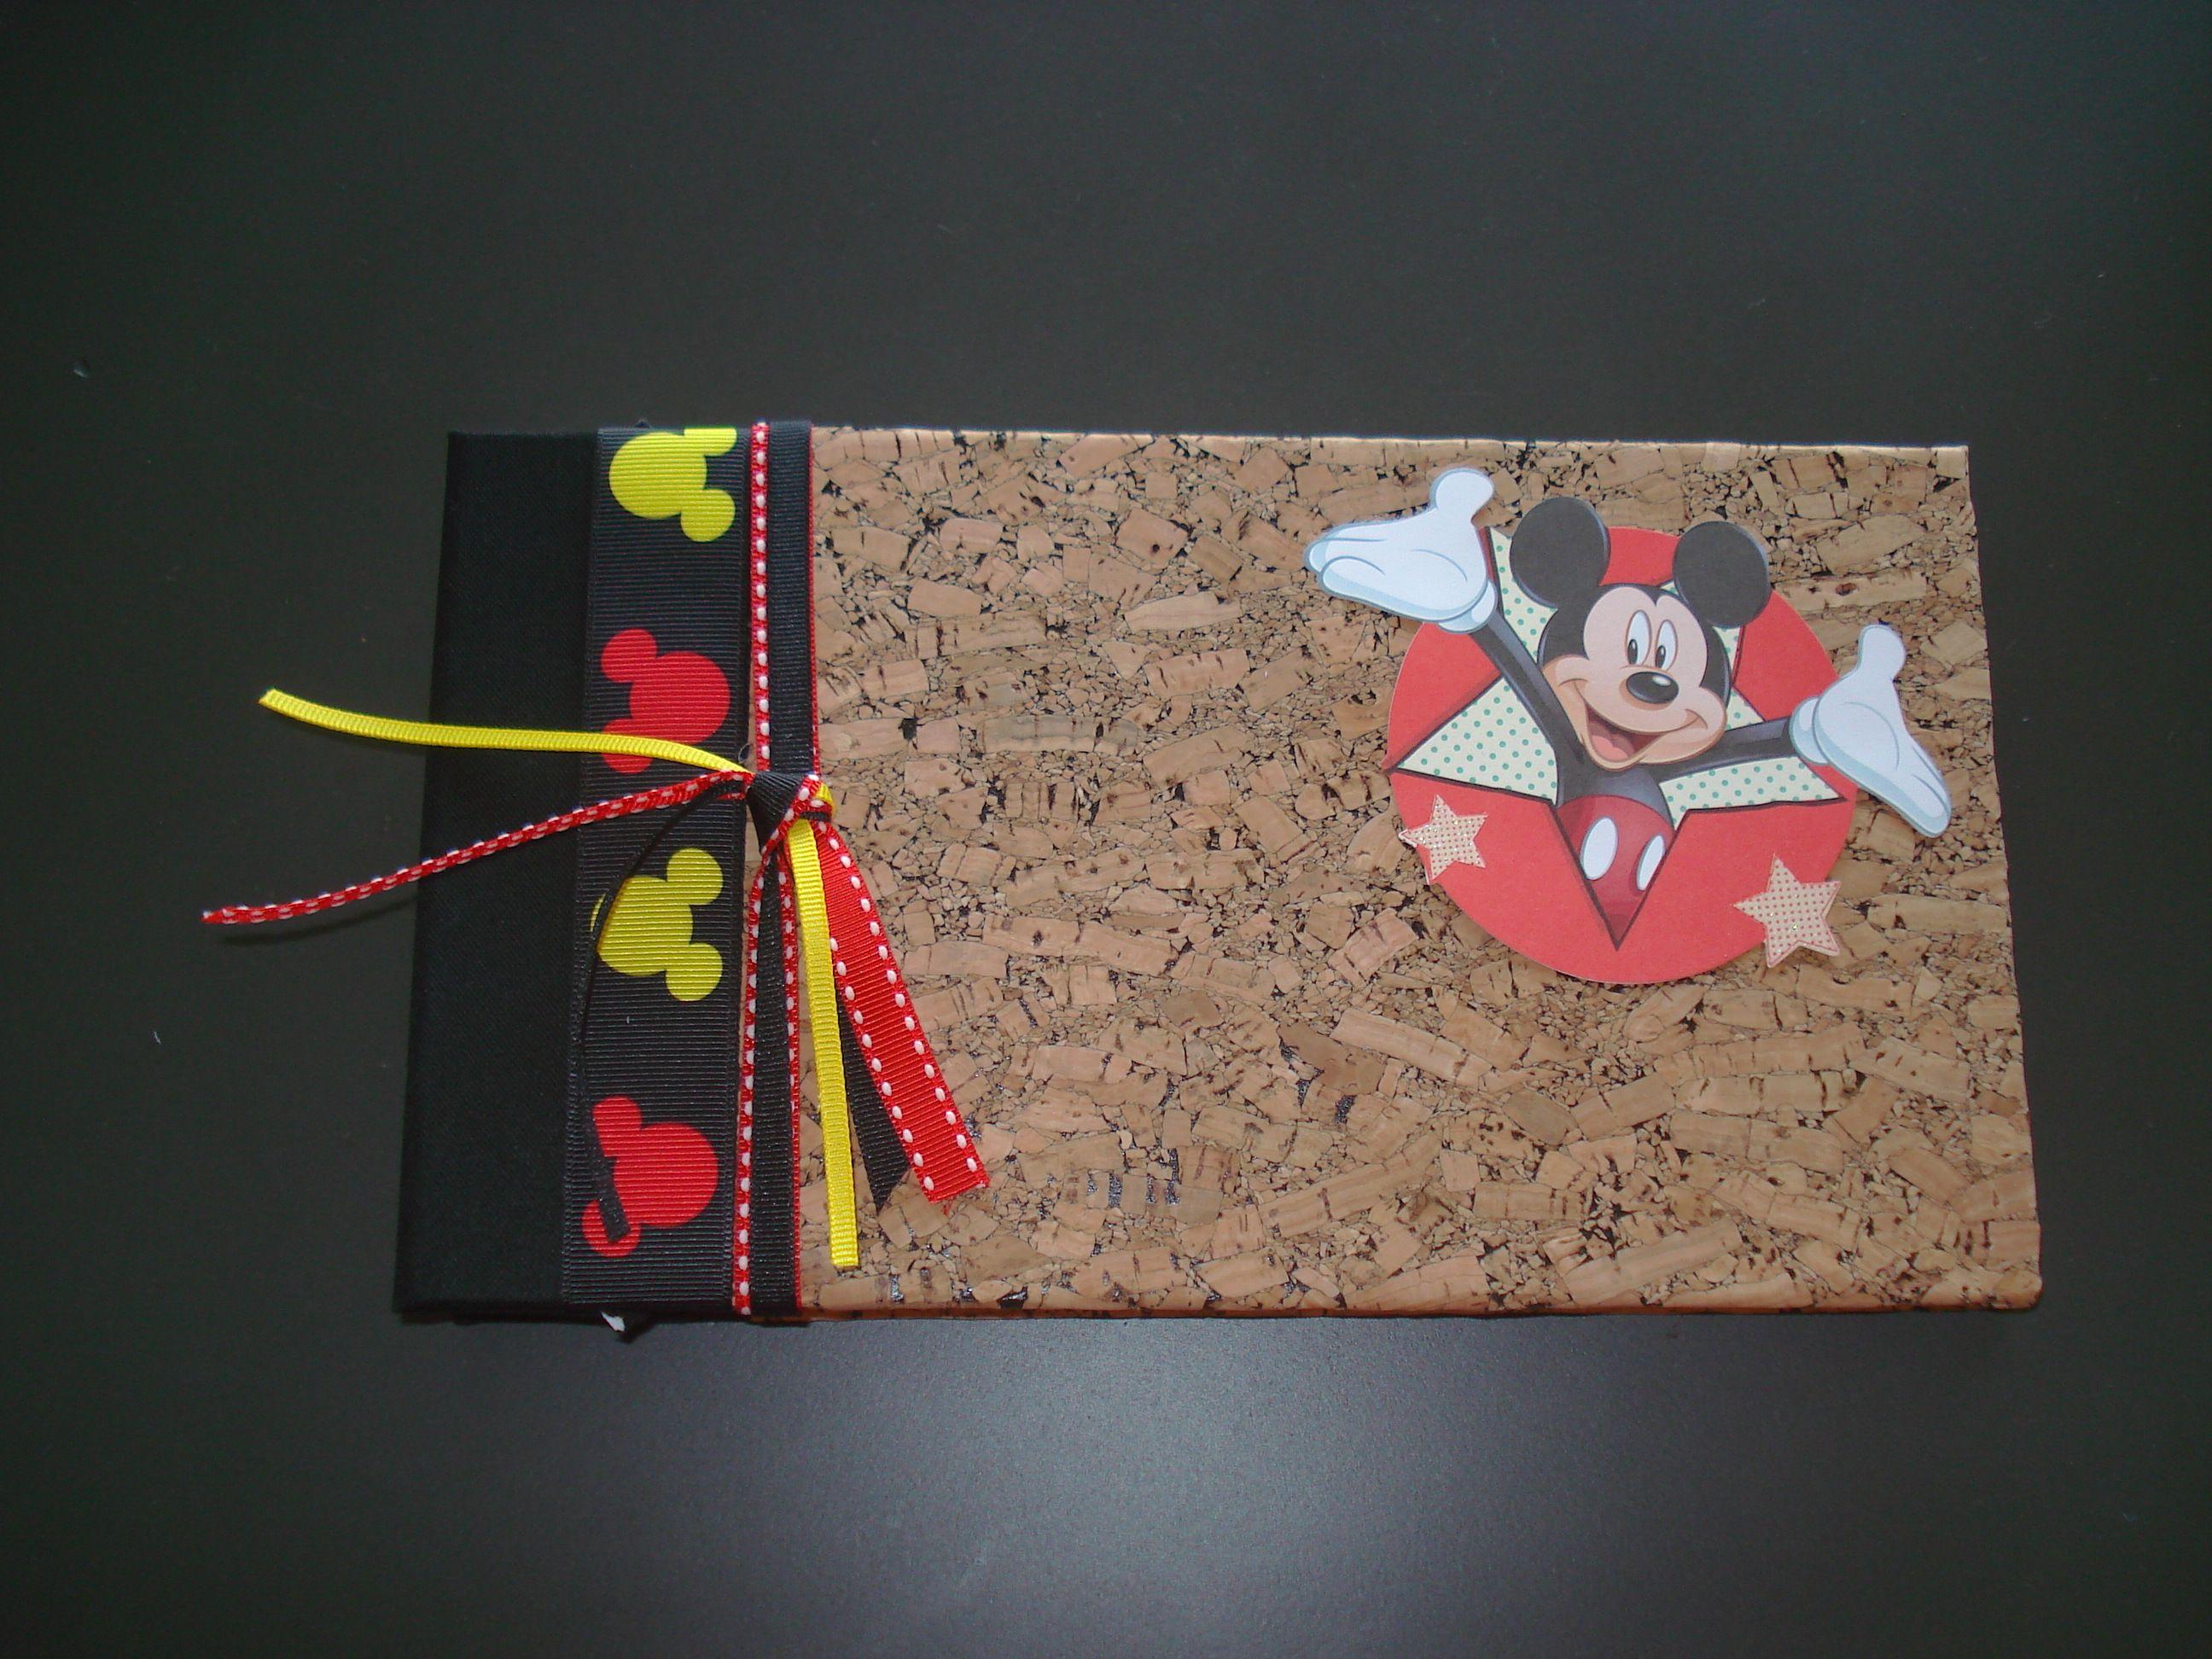 DIY photo album from Amazon.com, added Disney theme for autograph book.